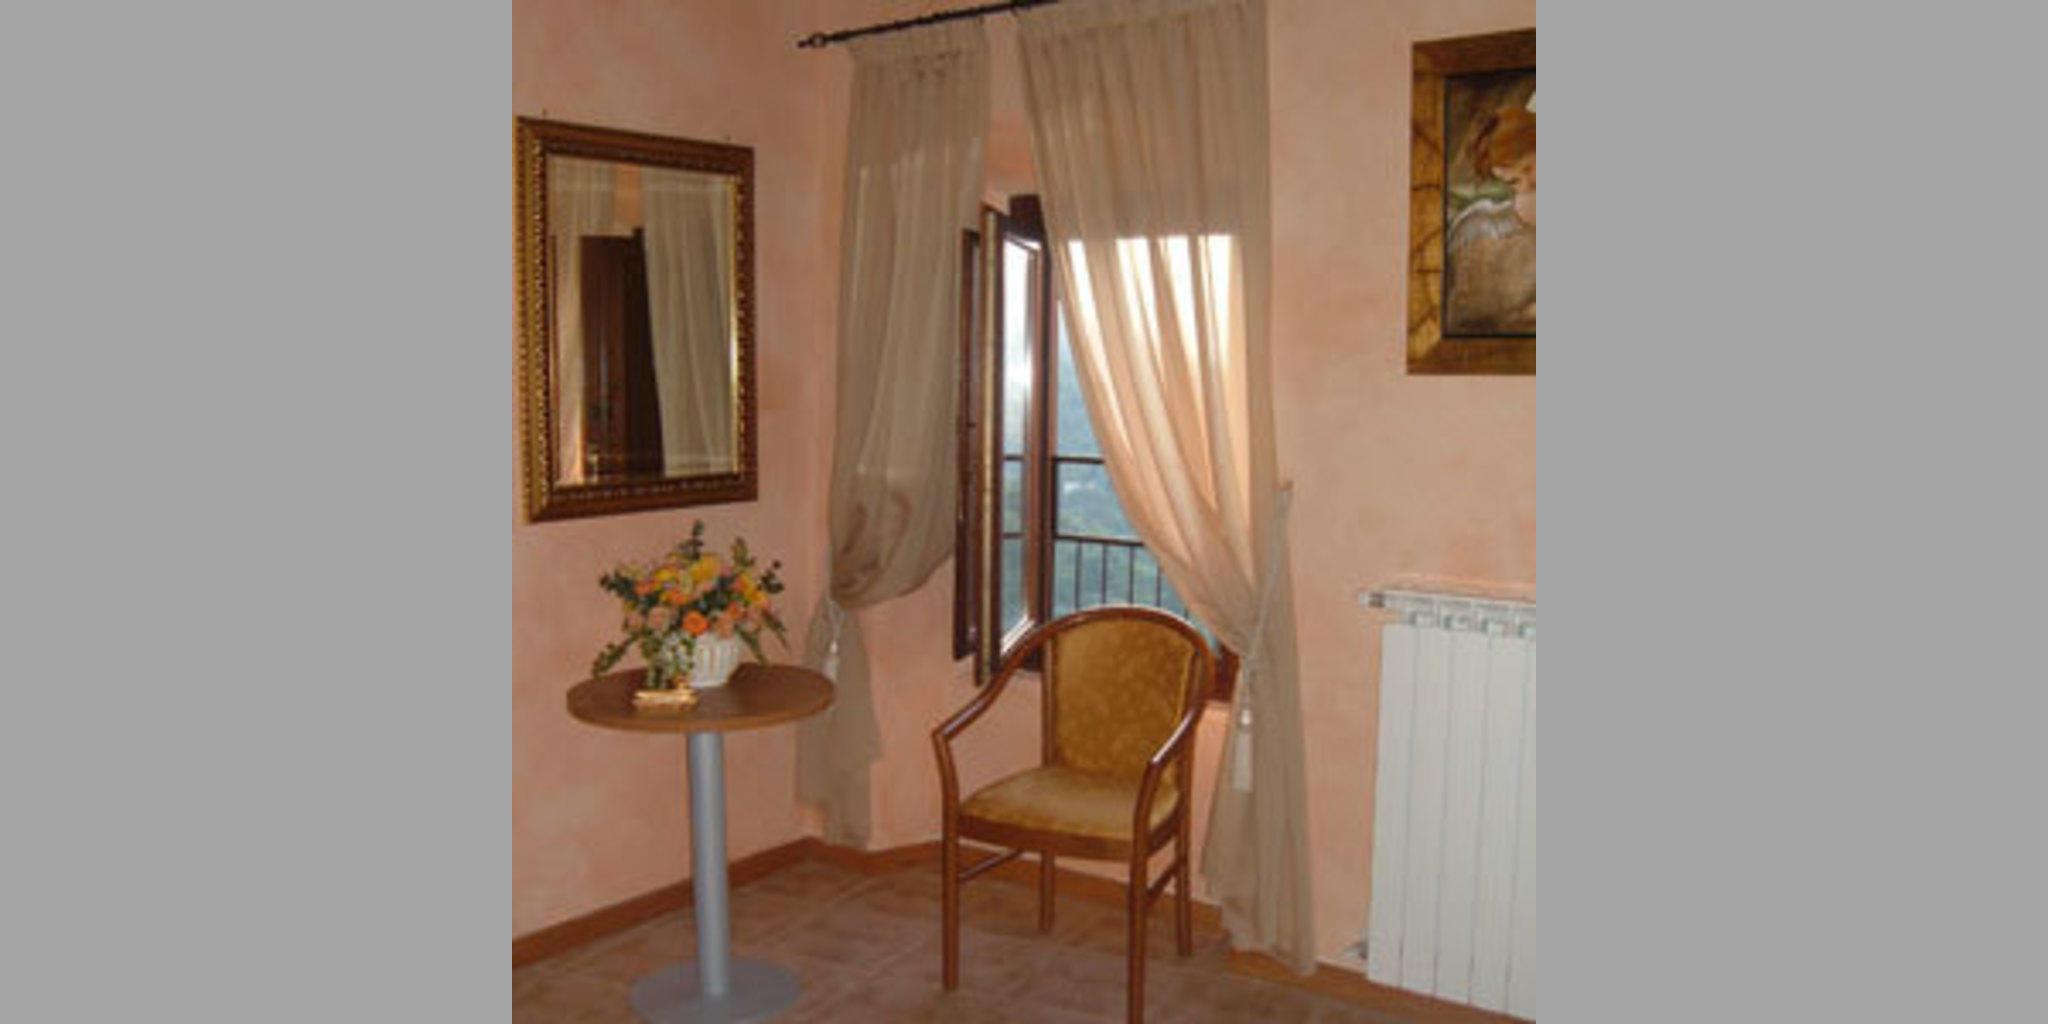 Bed & Breakfast Anticoli Corrado - Olivella 2